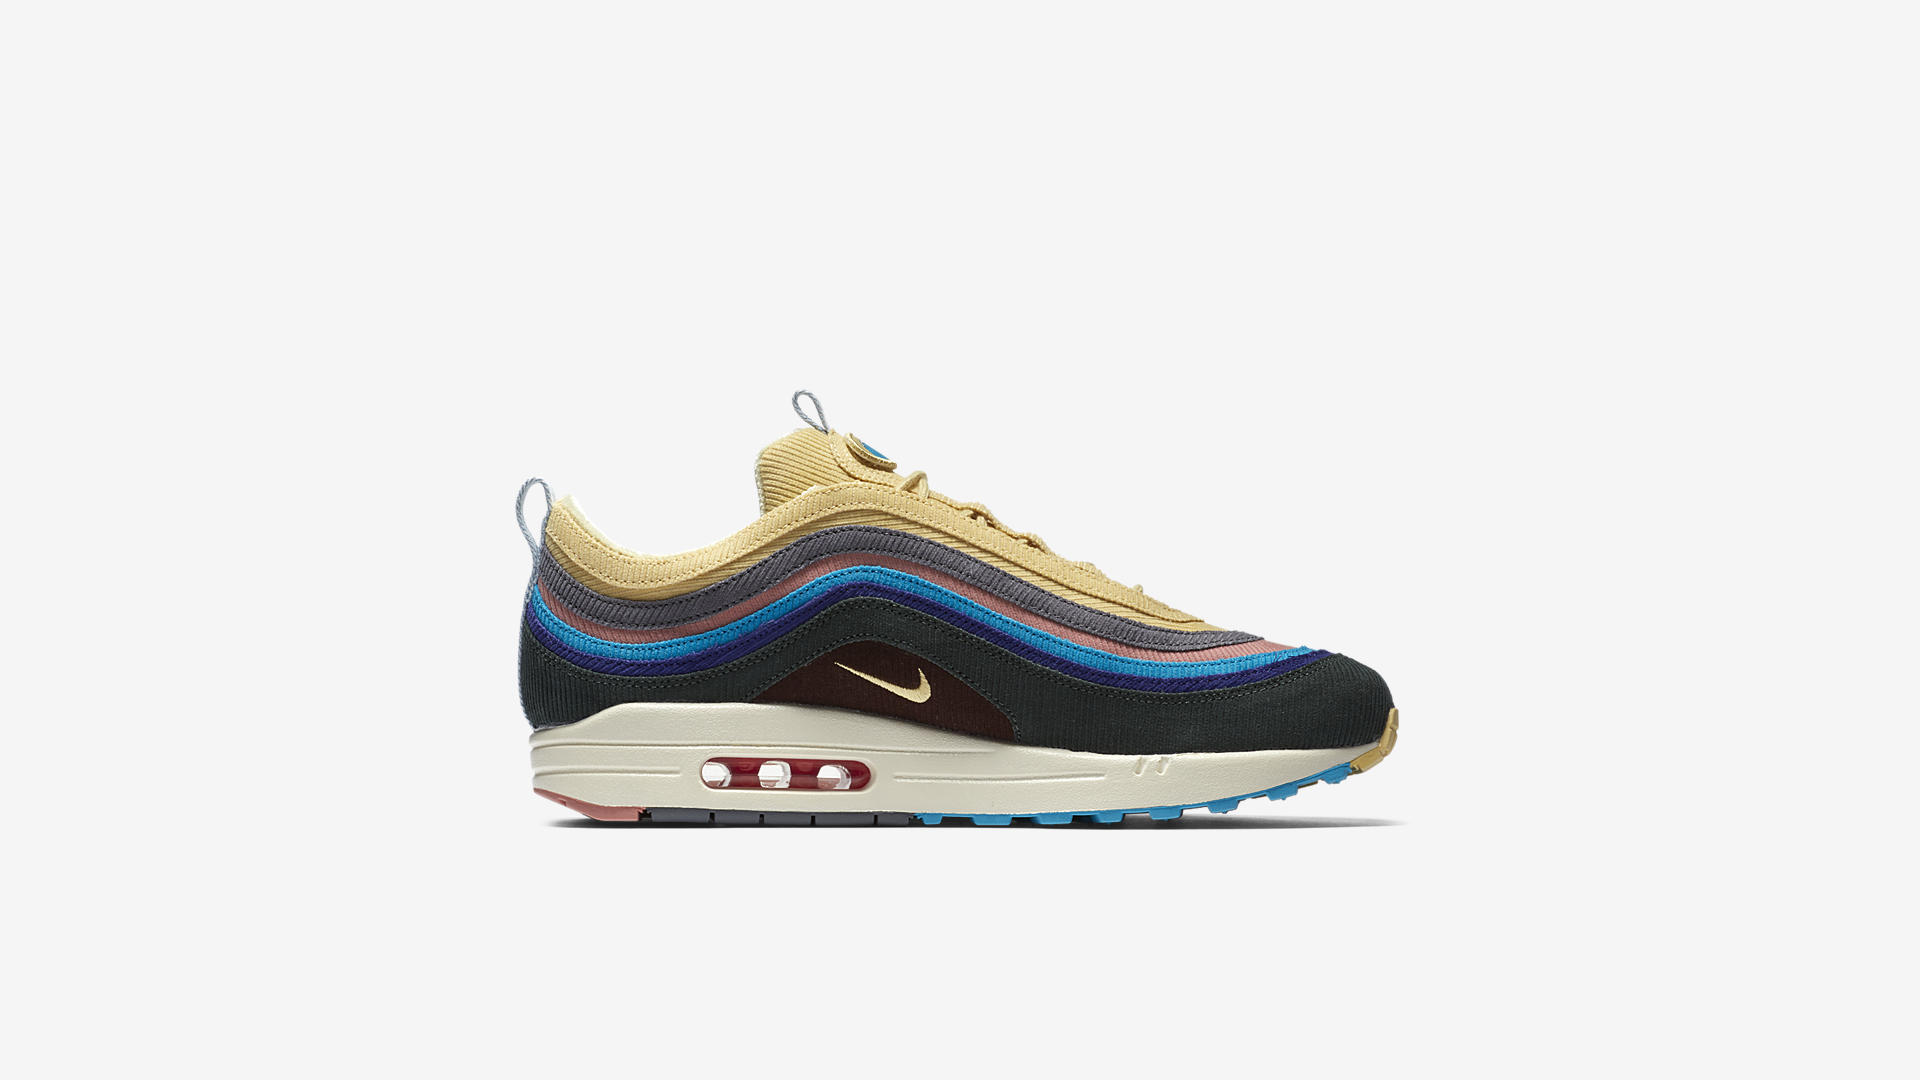 AJ4219 400 Nike Air Max 1 97 Sean Wotherspoon 3